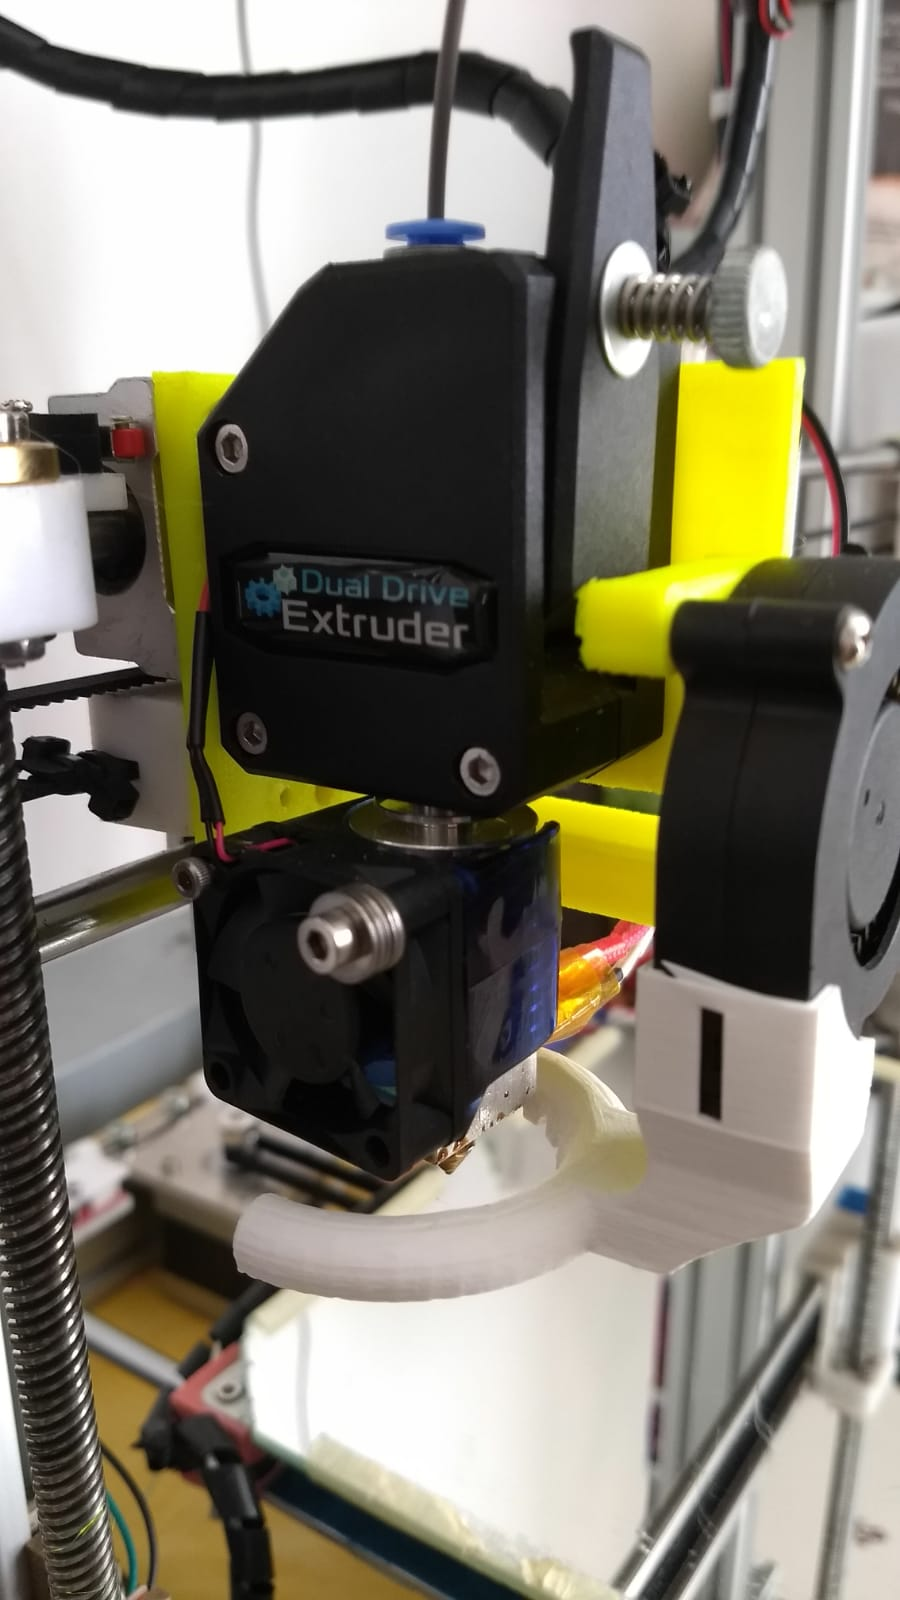 Holder for Trianglelab MK8 Bowden Extruder BMG extruder with V6